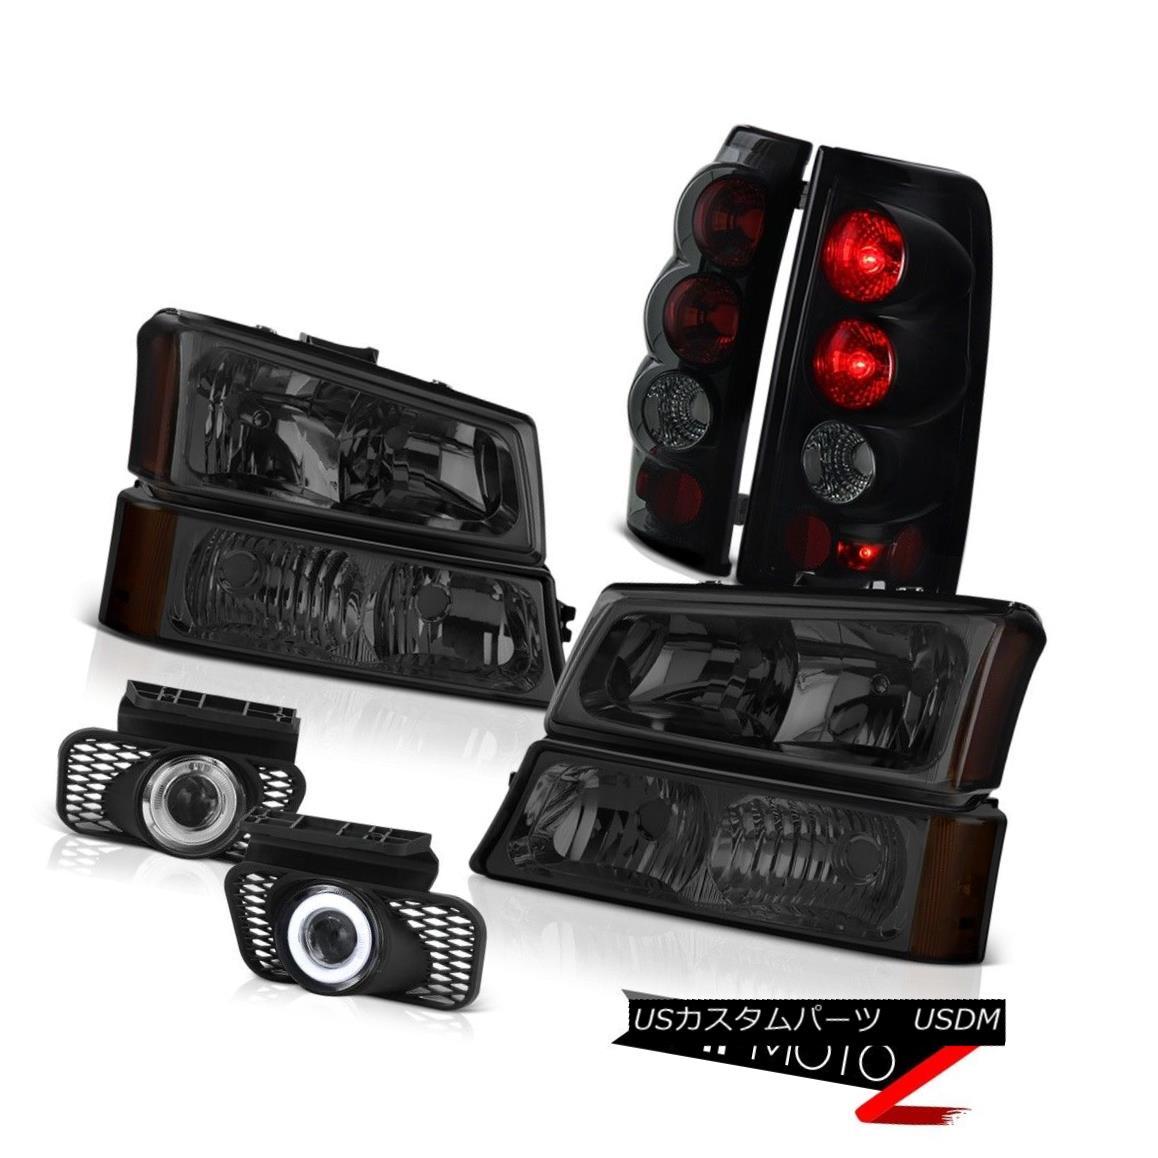 MINI R50 R52 R53 One Cooper S Right Headlight Headlamp Chrome Trim Ring JS